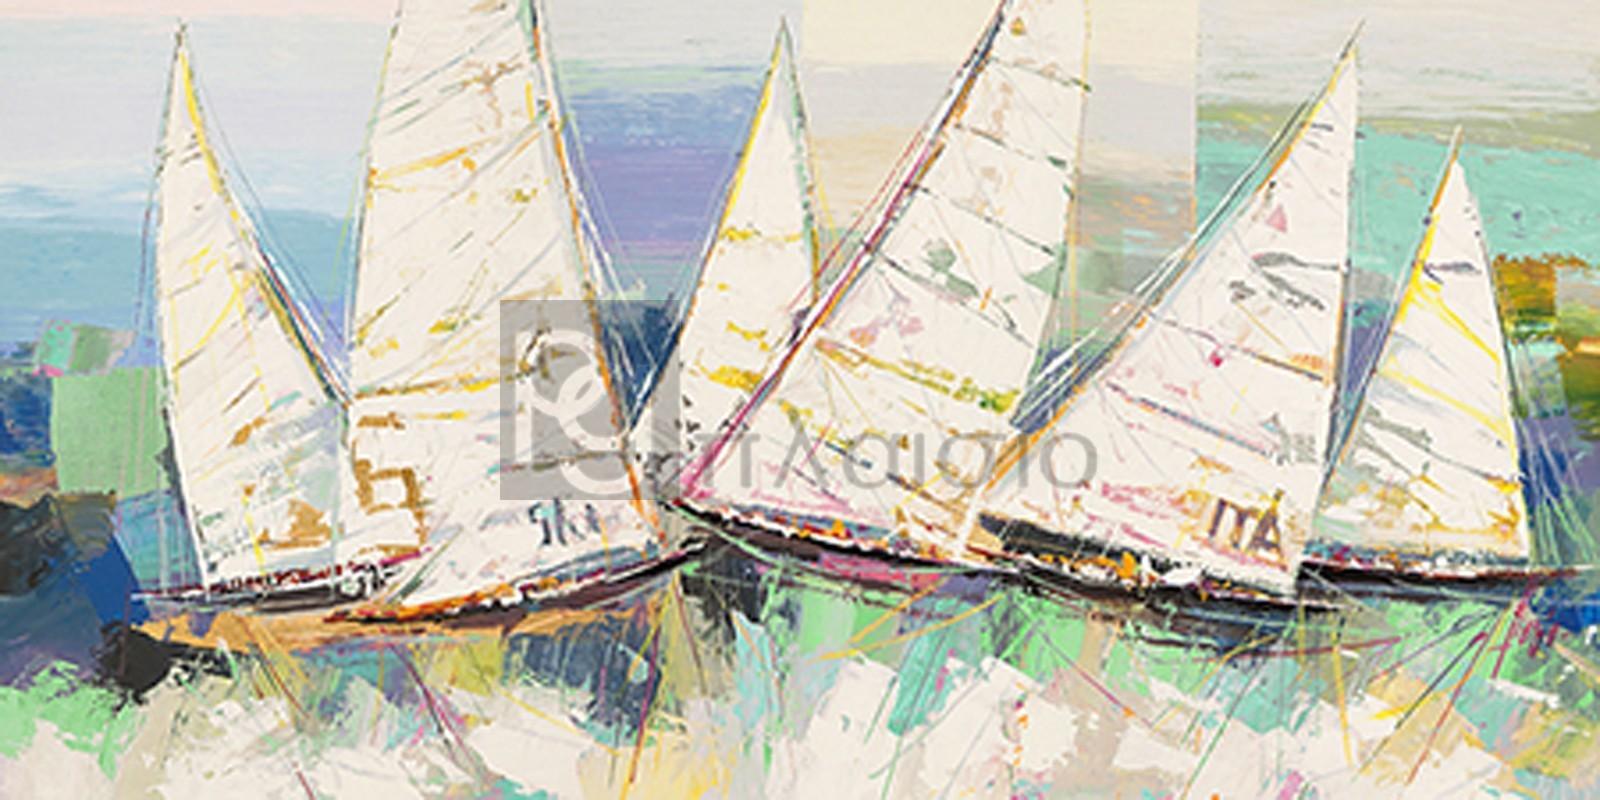 Luigi Florio - Nel mare dei Tropici